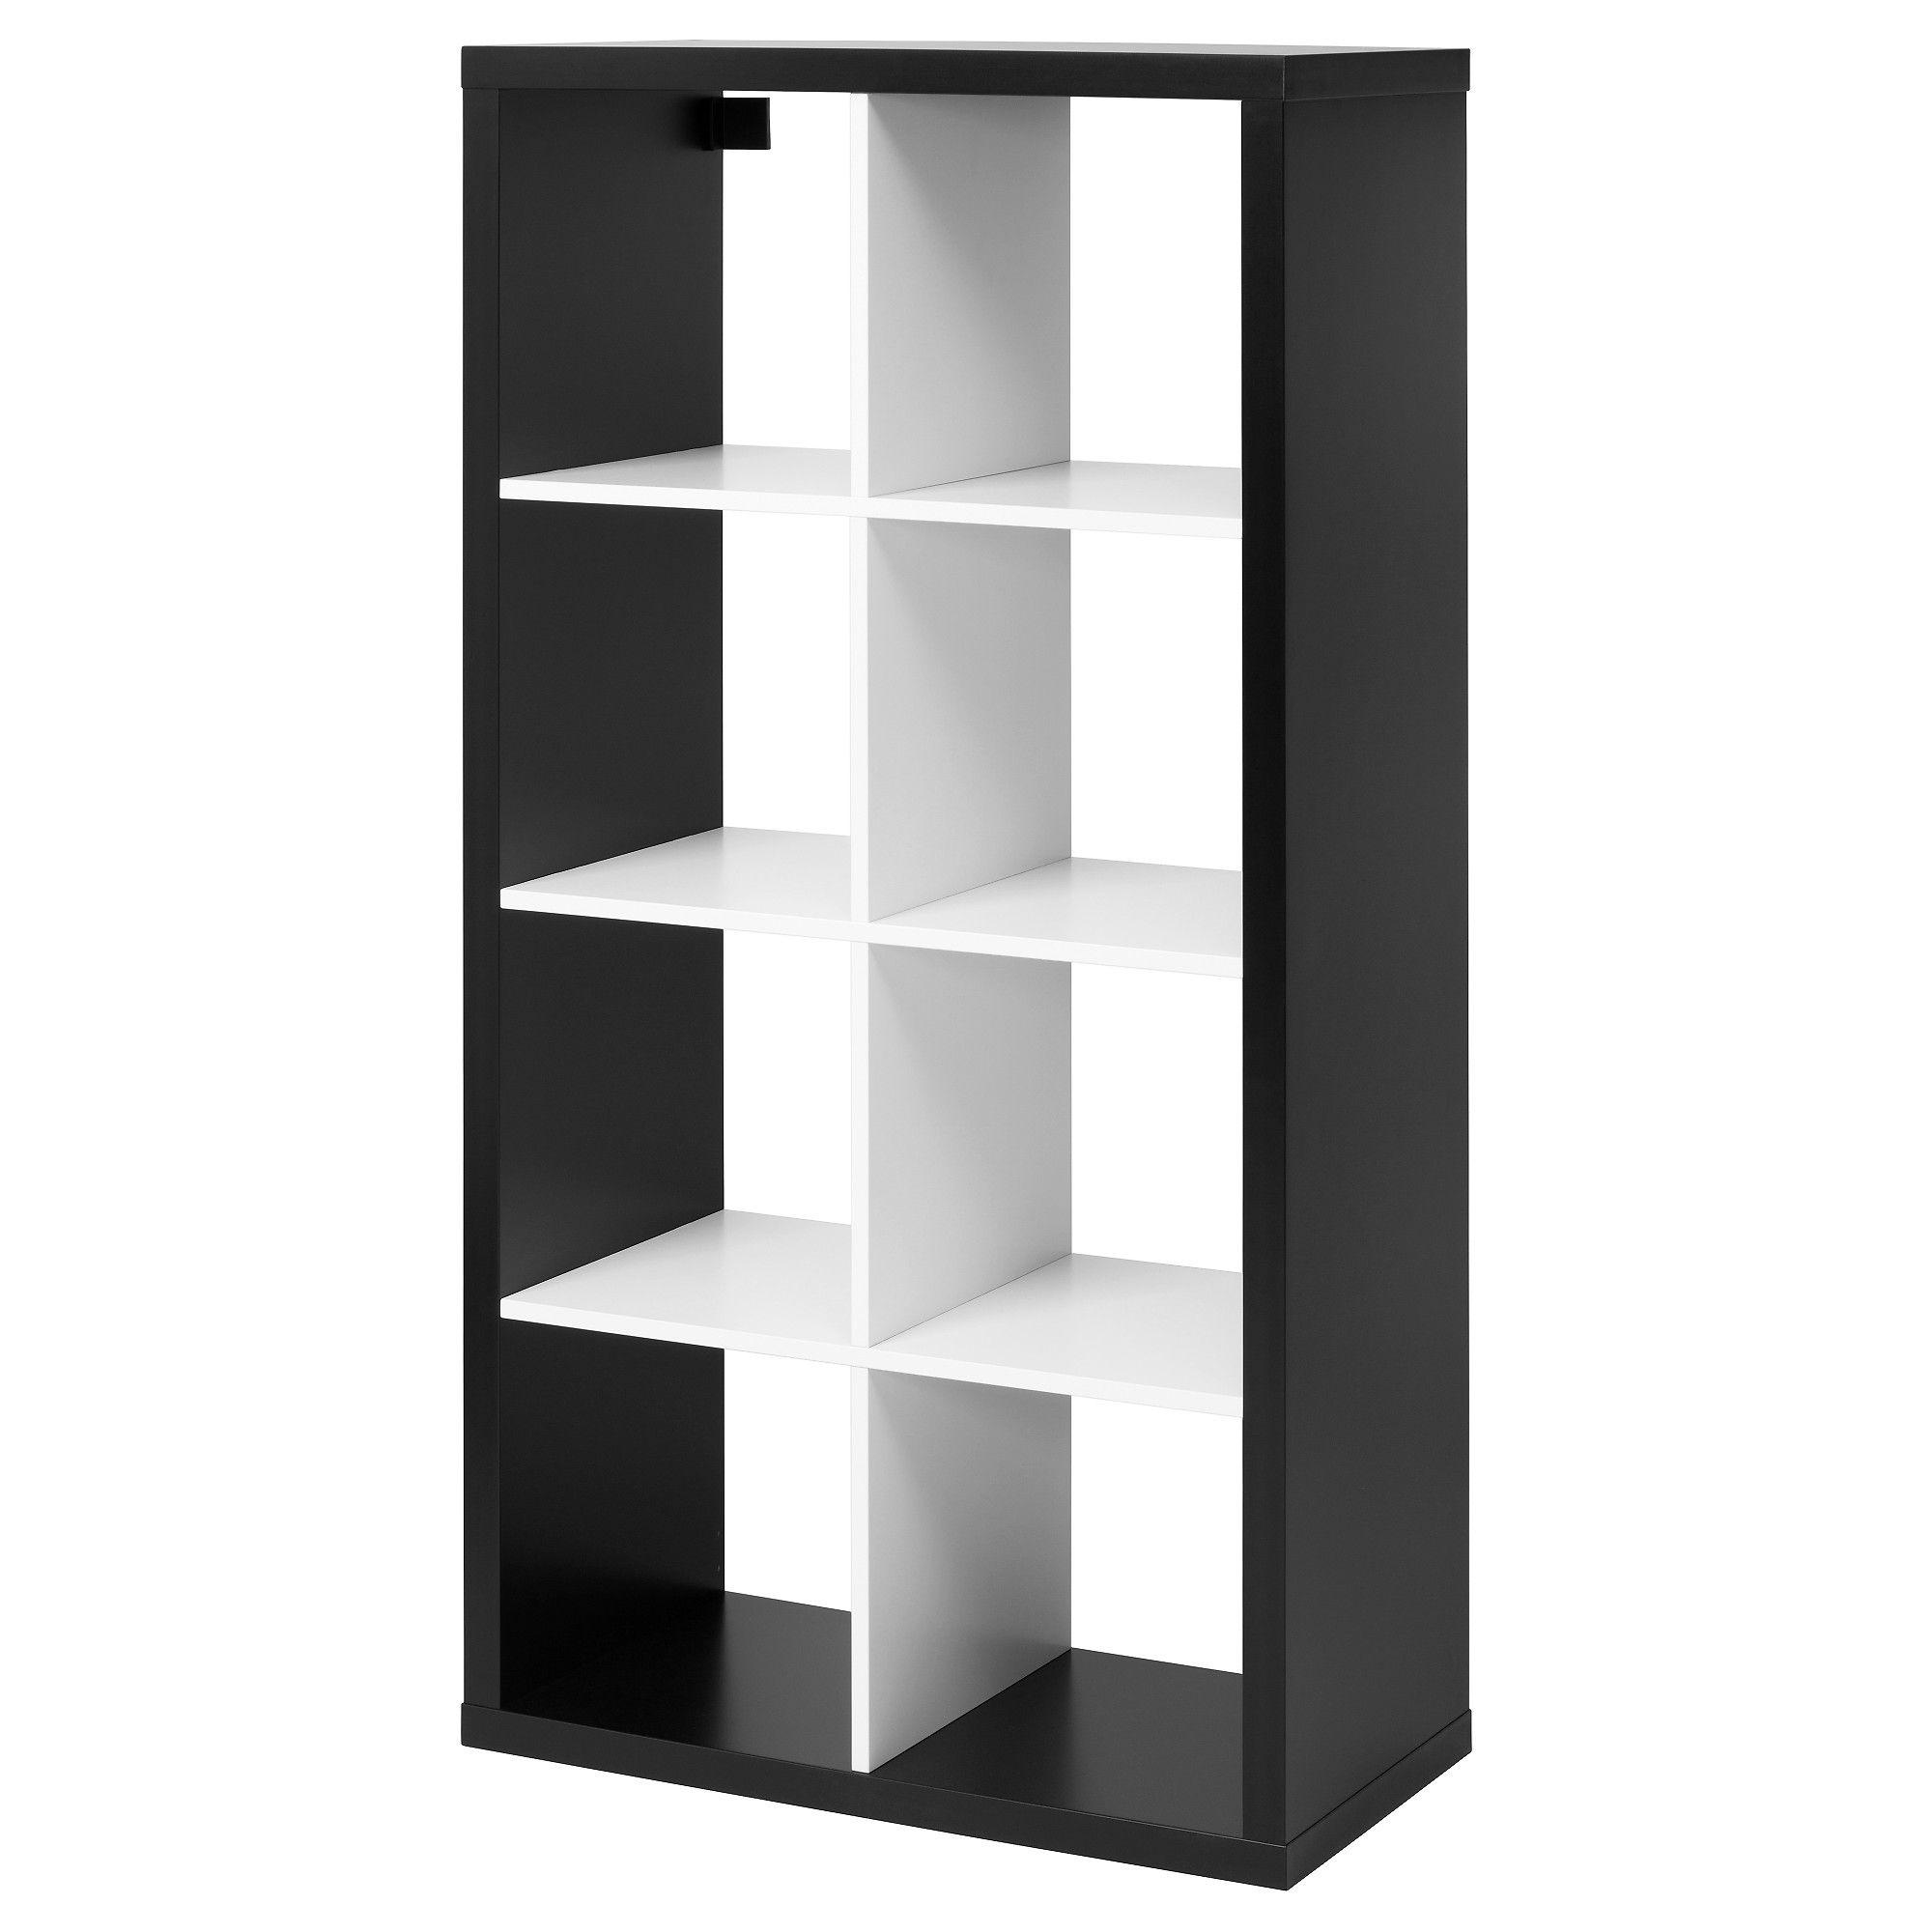 Ikea regalsystem kallax  KALLAX, Regal, schwarz, weiß Jetzt bestellen unter: https://moebel ...